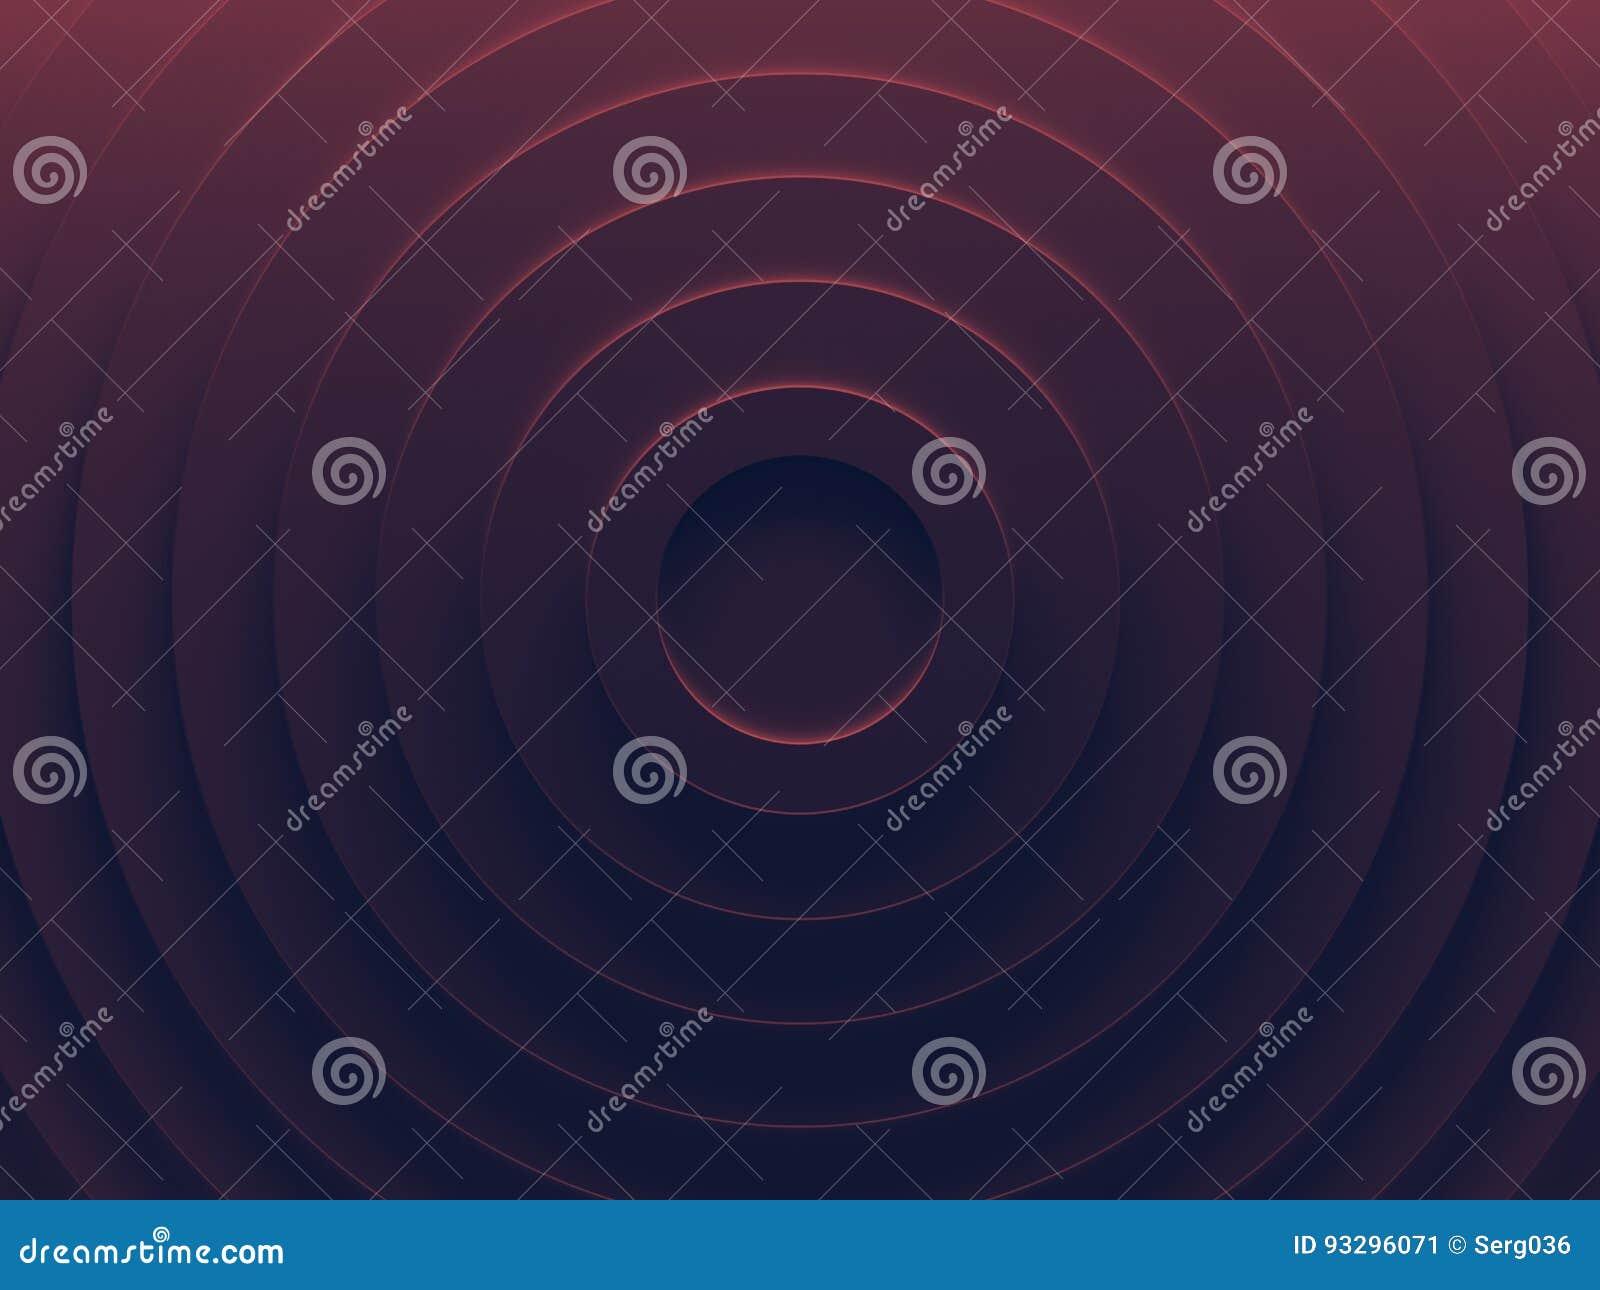 Pink vortex.abstract background for graphic design, book cover template, website design, application design. 3D illustration.